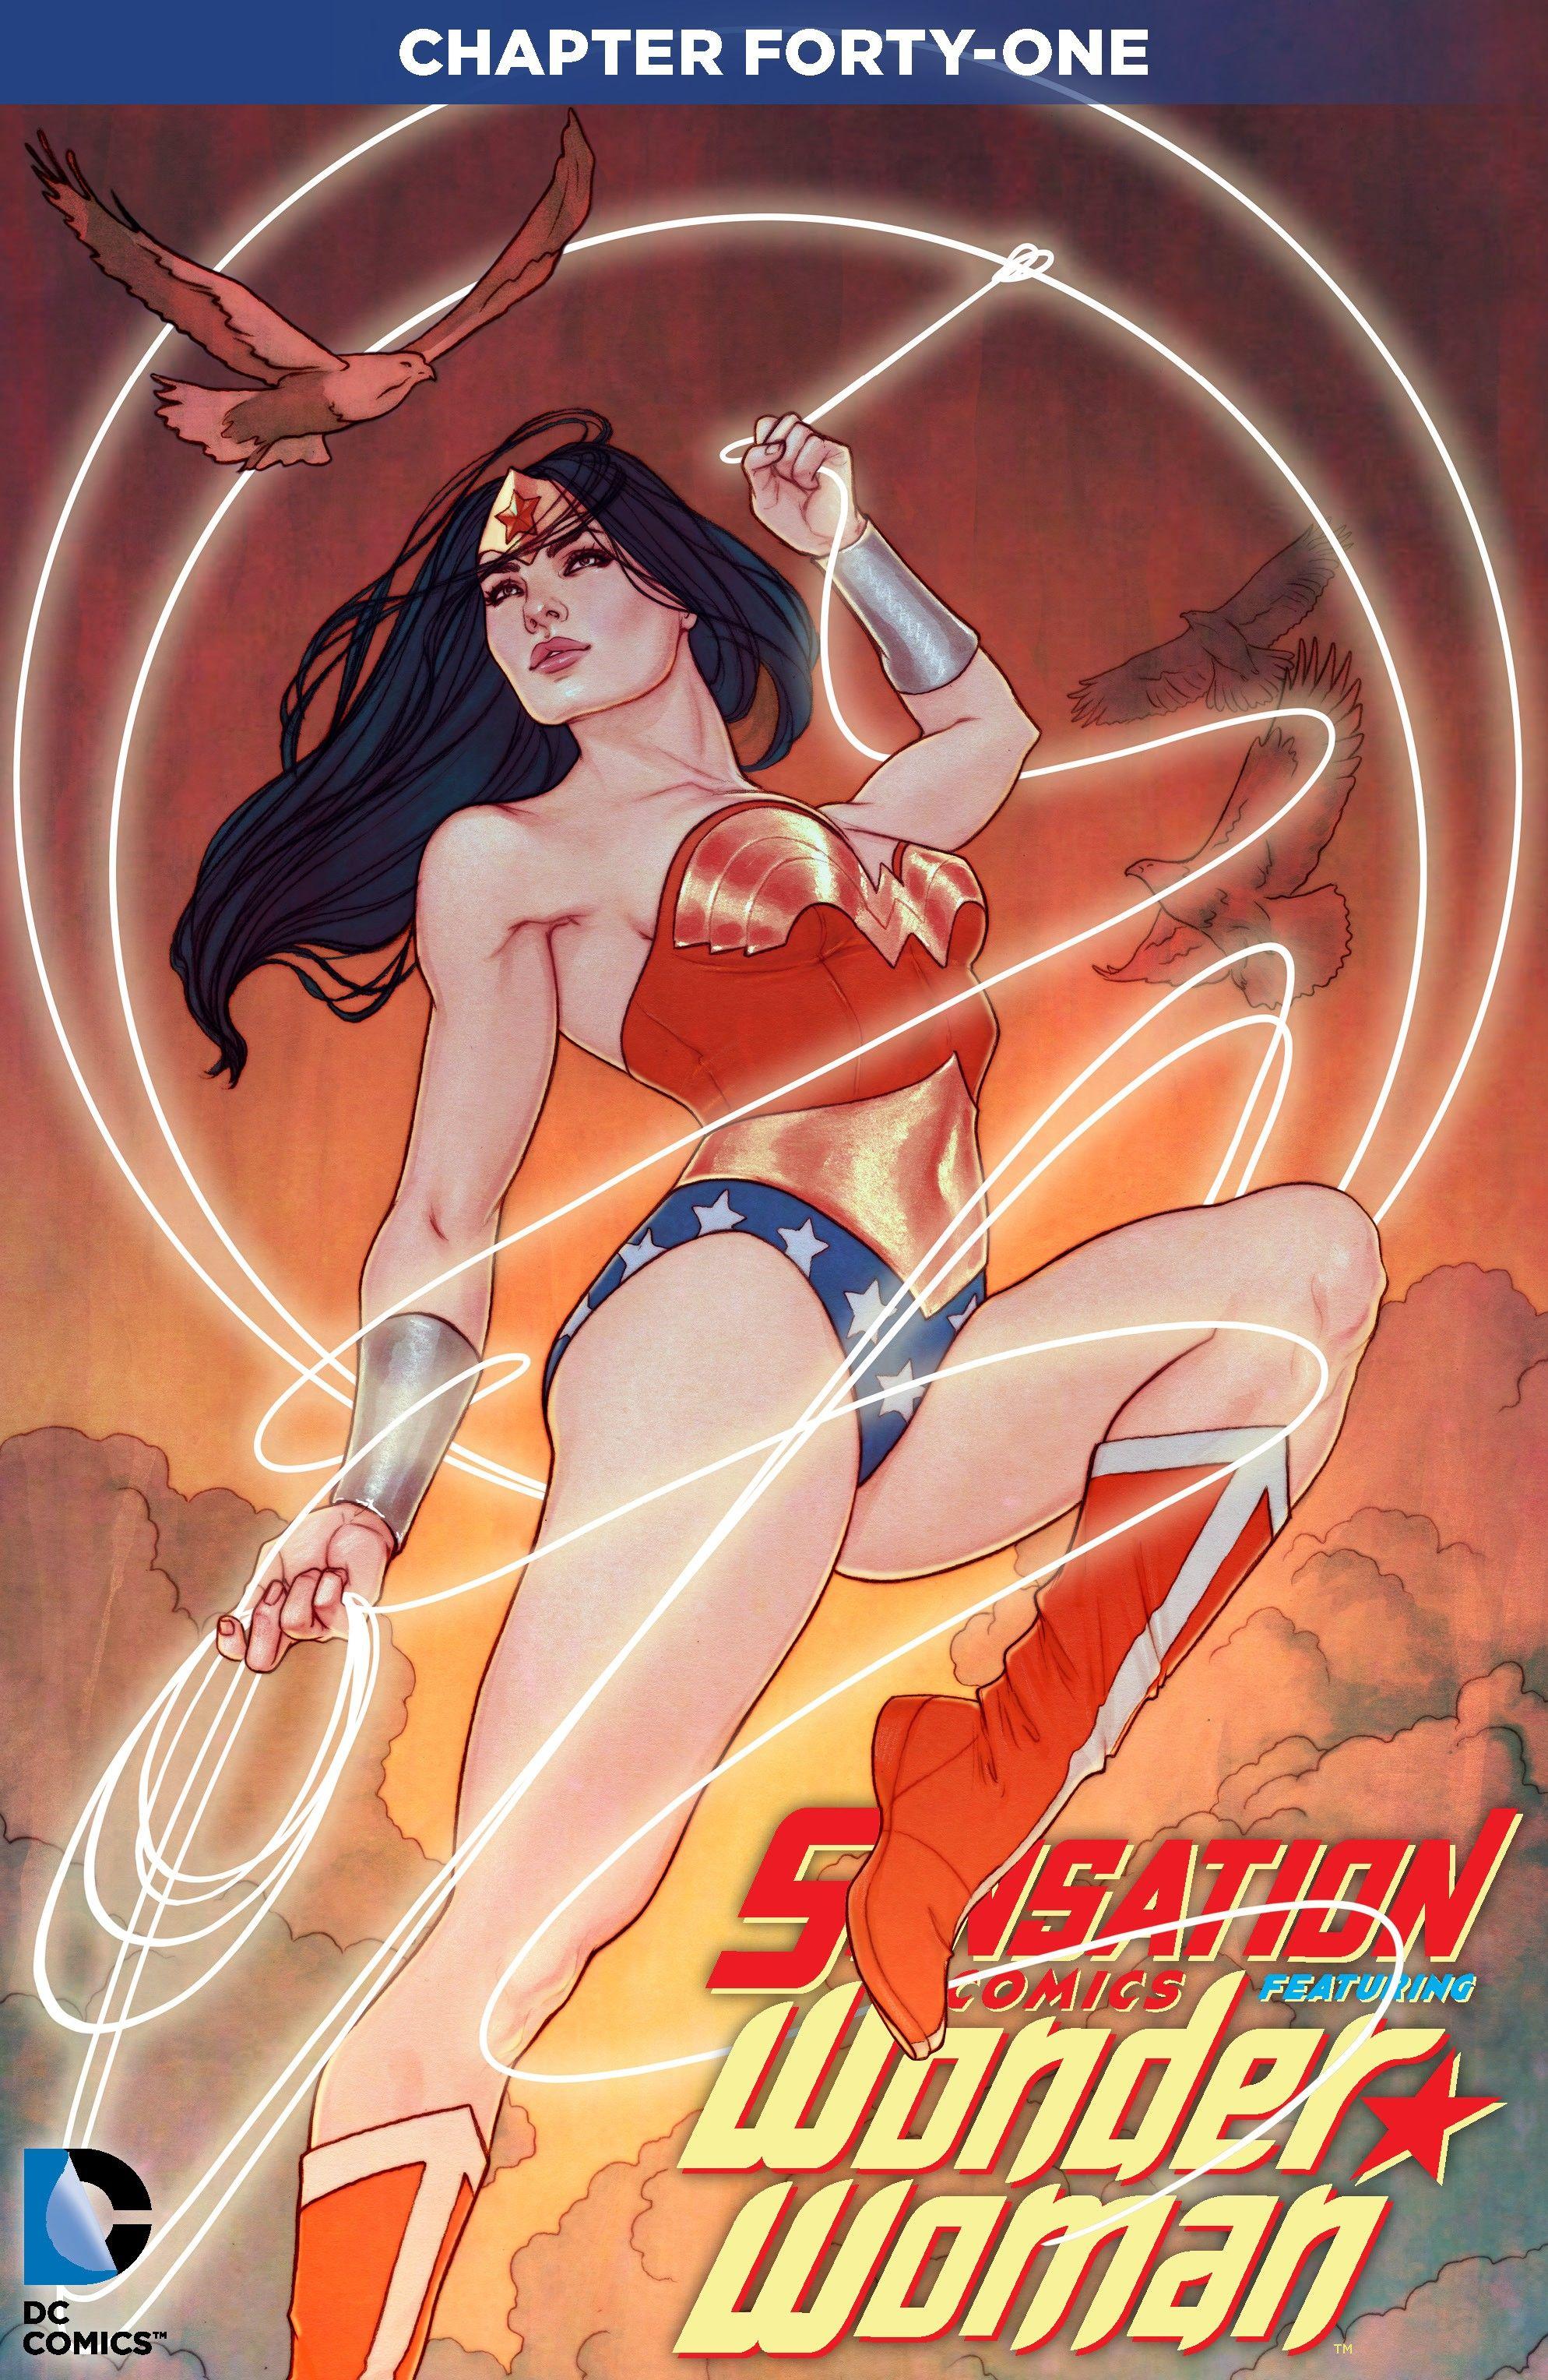 Read online Sensation Comics Featuring Wonder Woman comic -  Issue #41 - 2